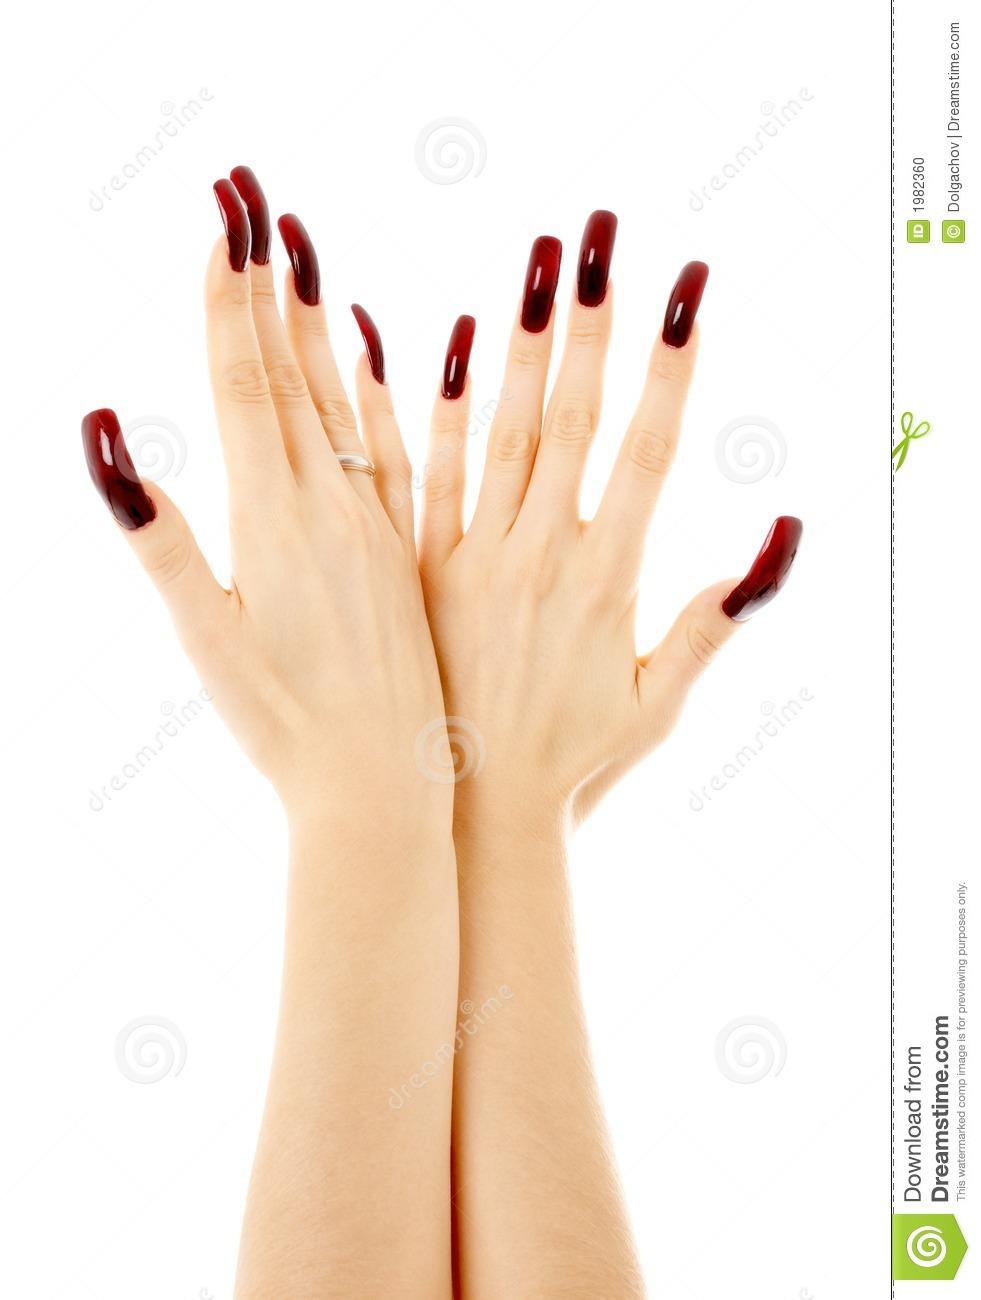 acrylic nails hands photo - 1